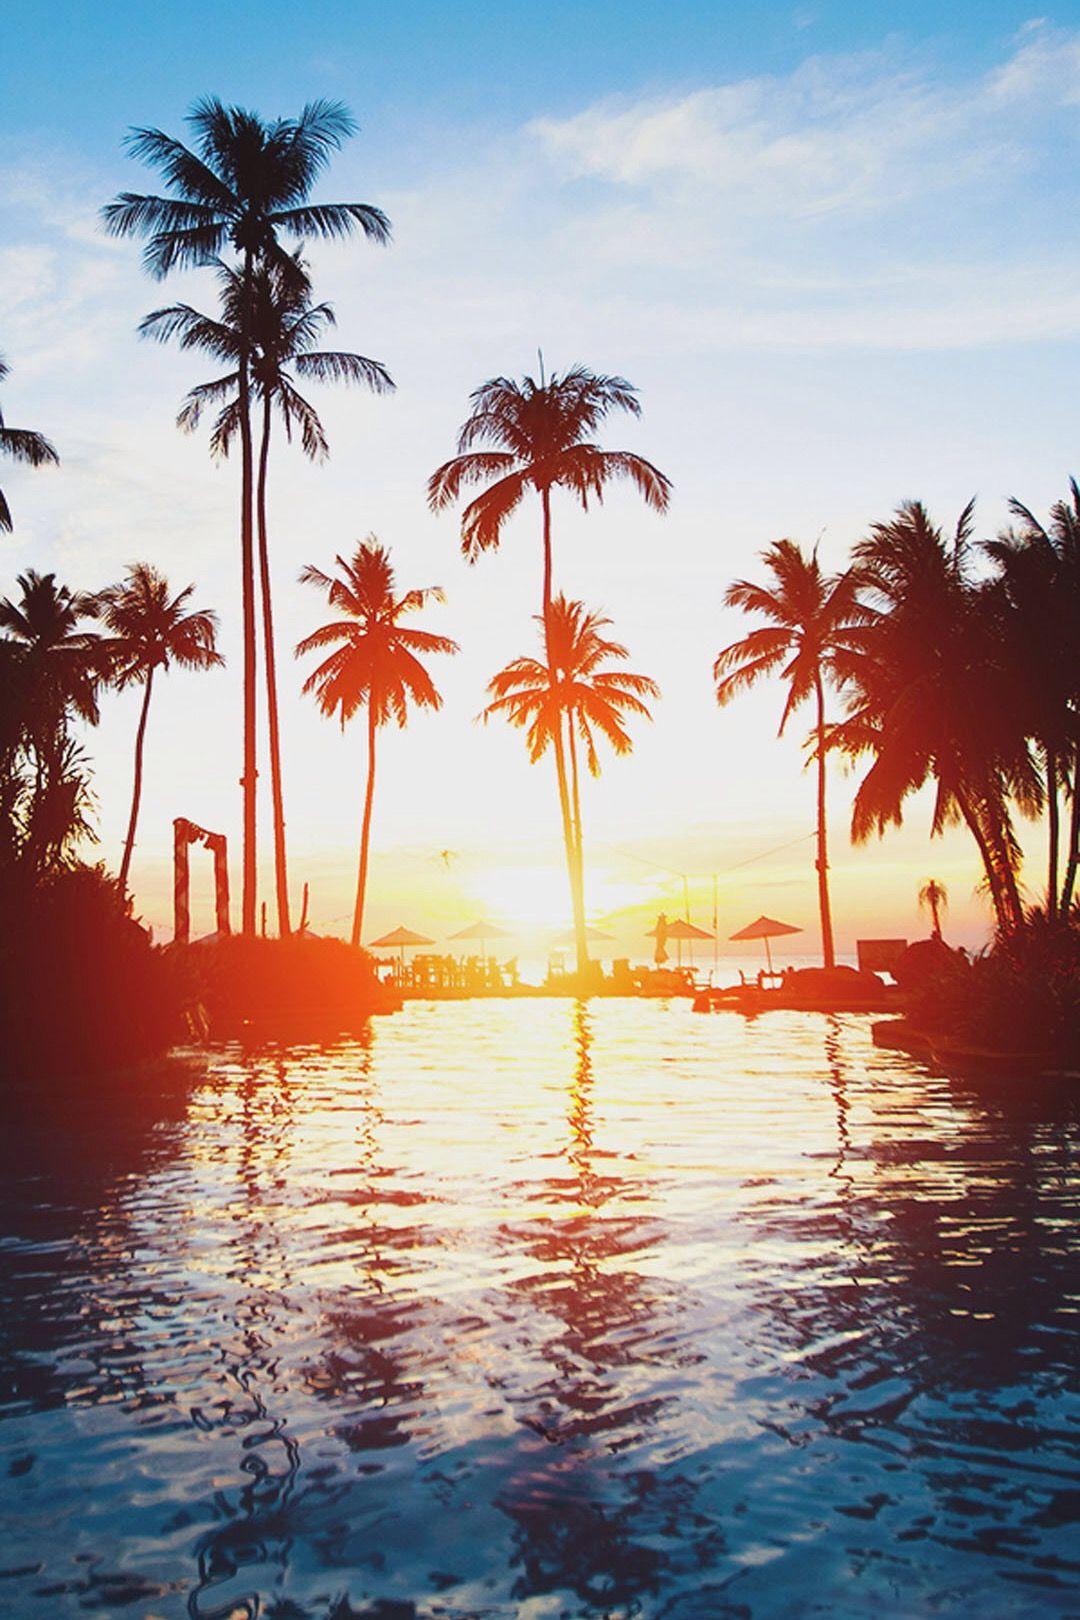 Nature Sunset Beach Coconut Grove iPhone 7 wallpaper